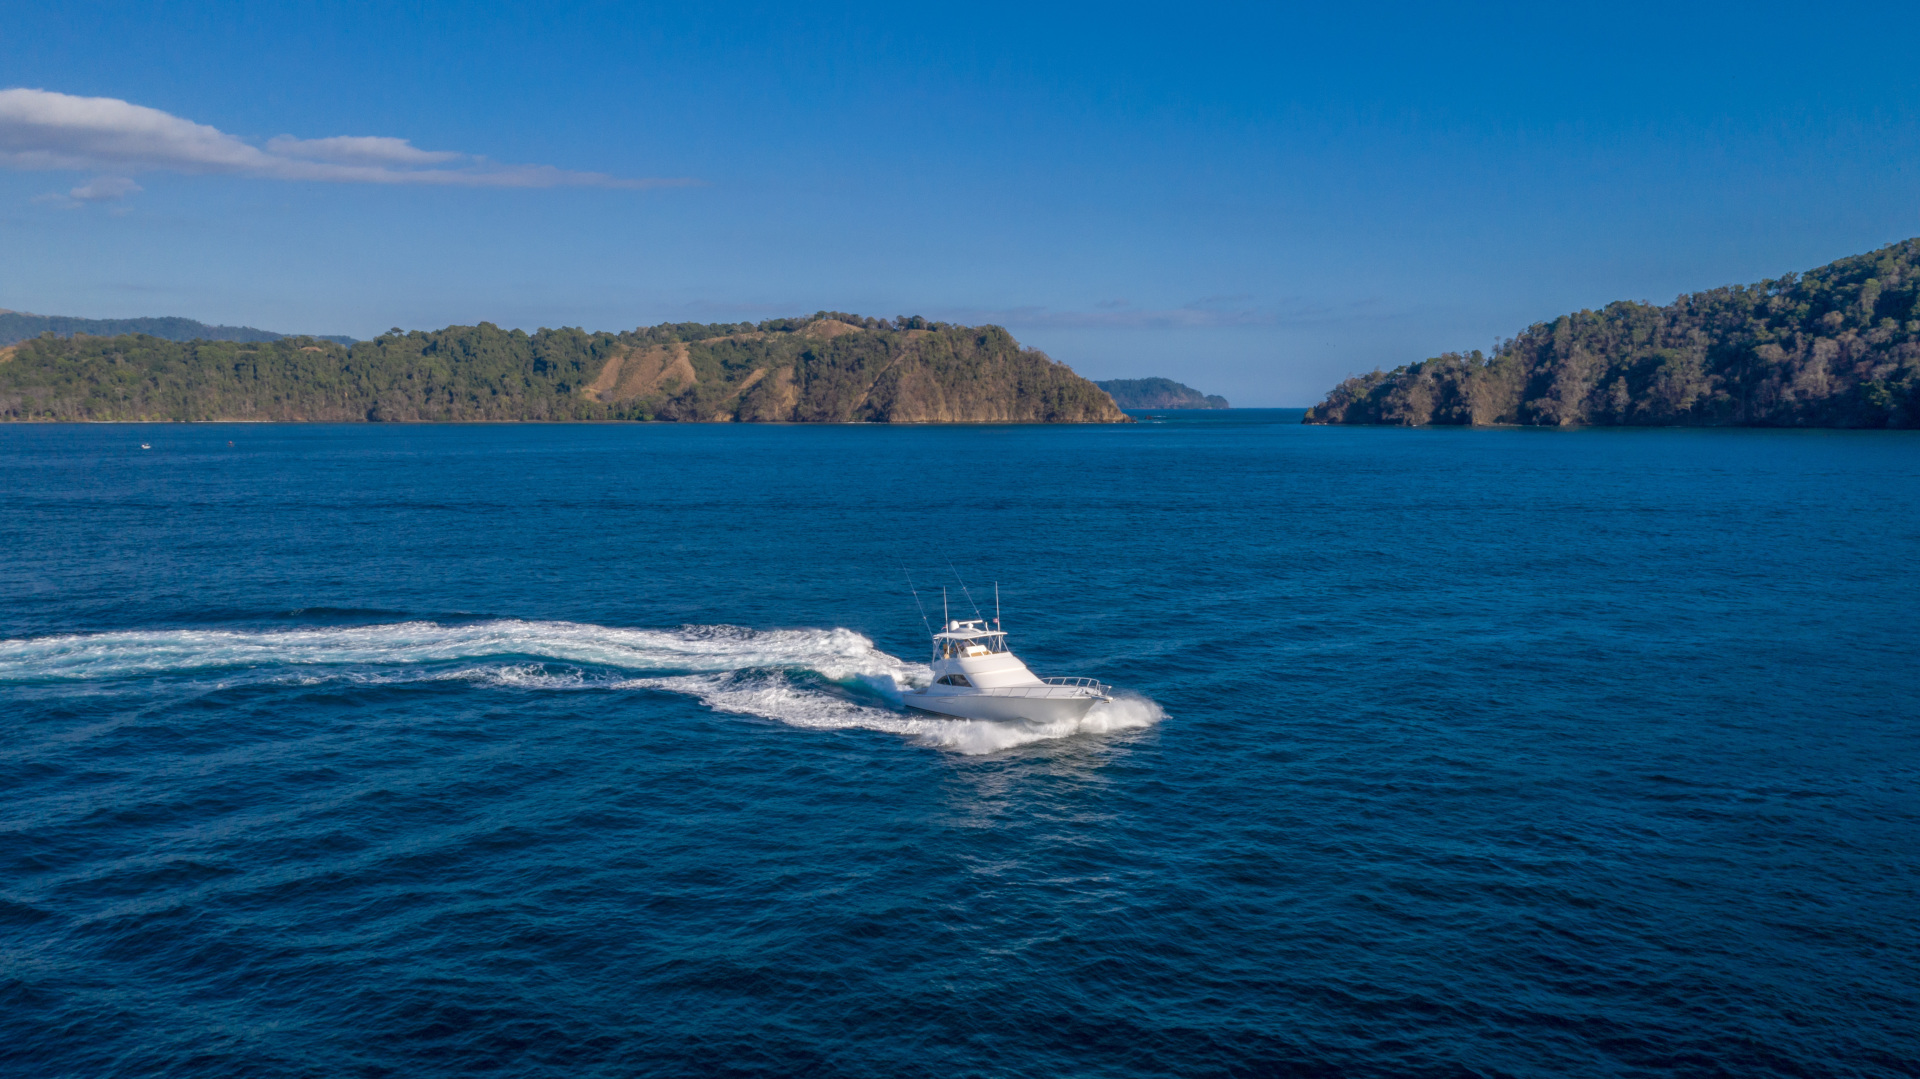 Viking-62 Convertible 2014-Mixer Playa Herradura, Los Suenos,-Costa Rica-2014 Viking 62 Convertible  Starboard Profile Running-1356278 | Thumbnail